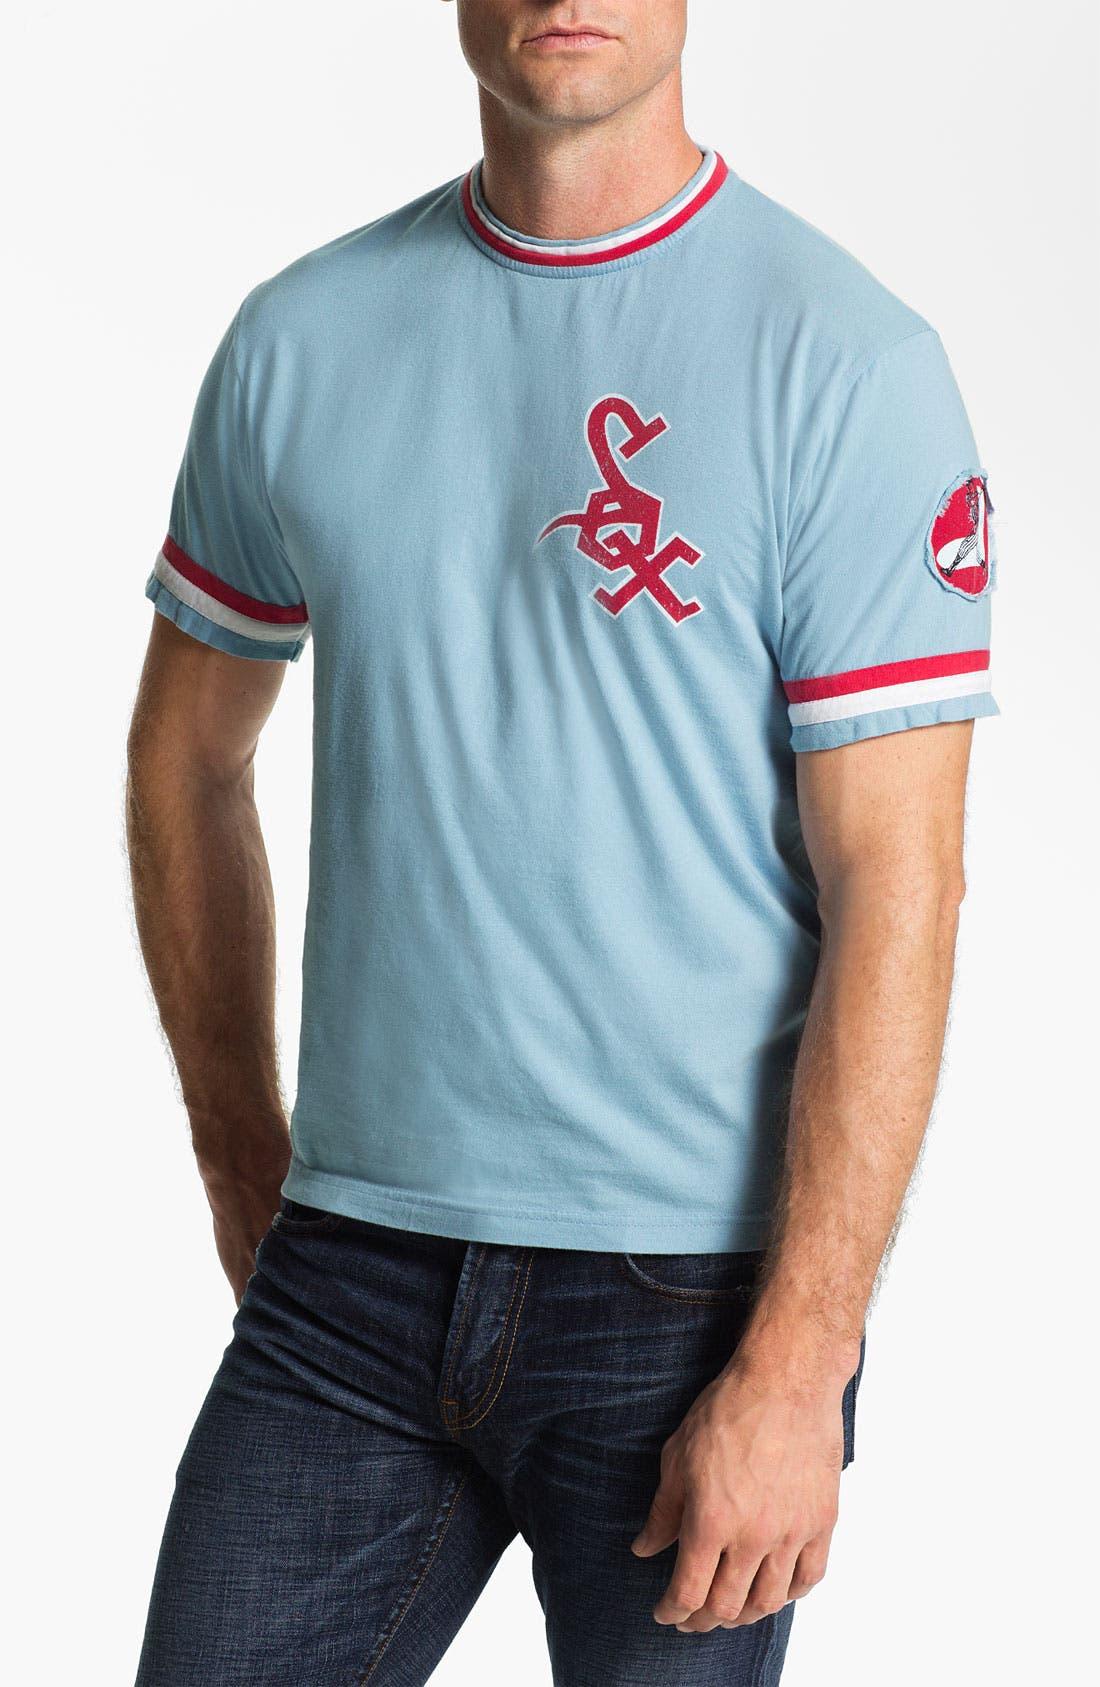 Main Image - Red Jacket 'Chicago White Sox' Ringer Trim Fit T-Shirt (Men)